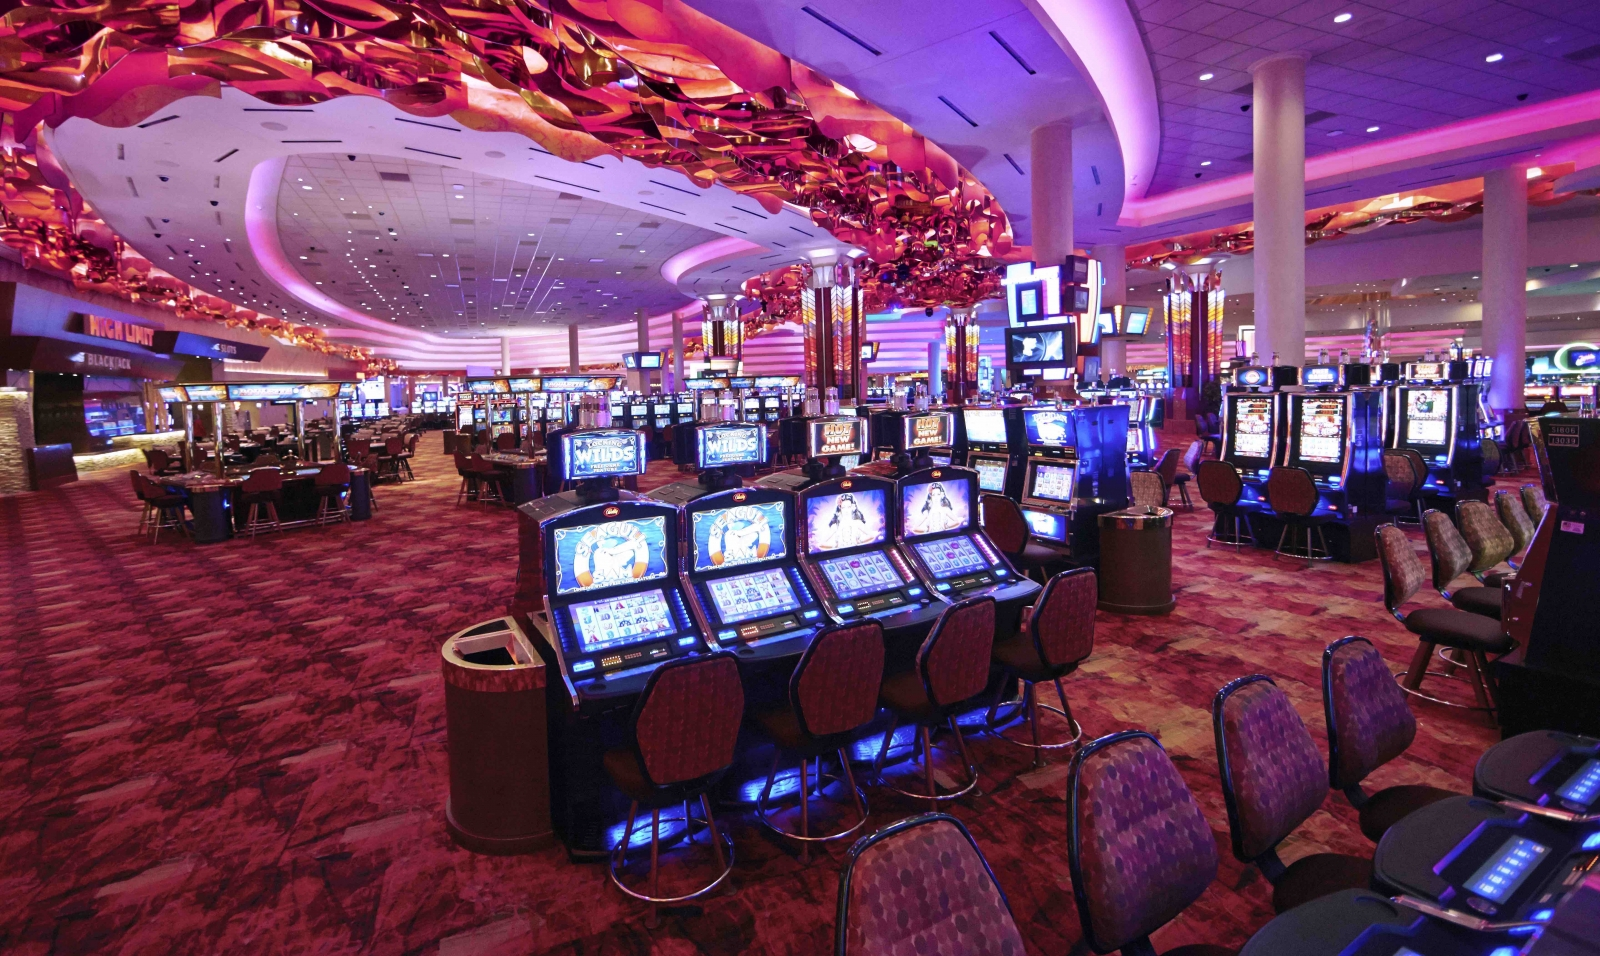 Mystic Lake Casino's interior. Slots abound. Courtesy Mystic Lake Casino Hotel.